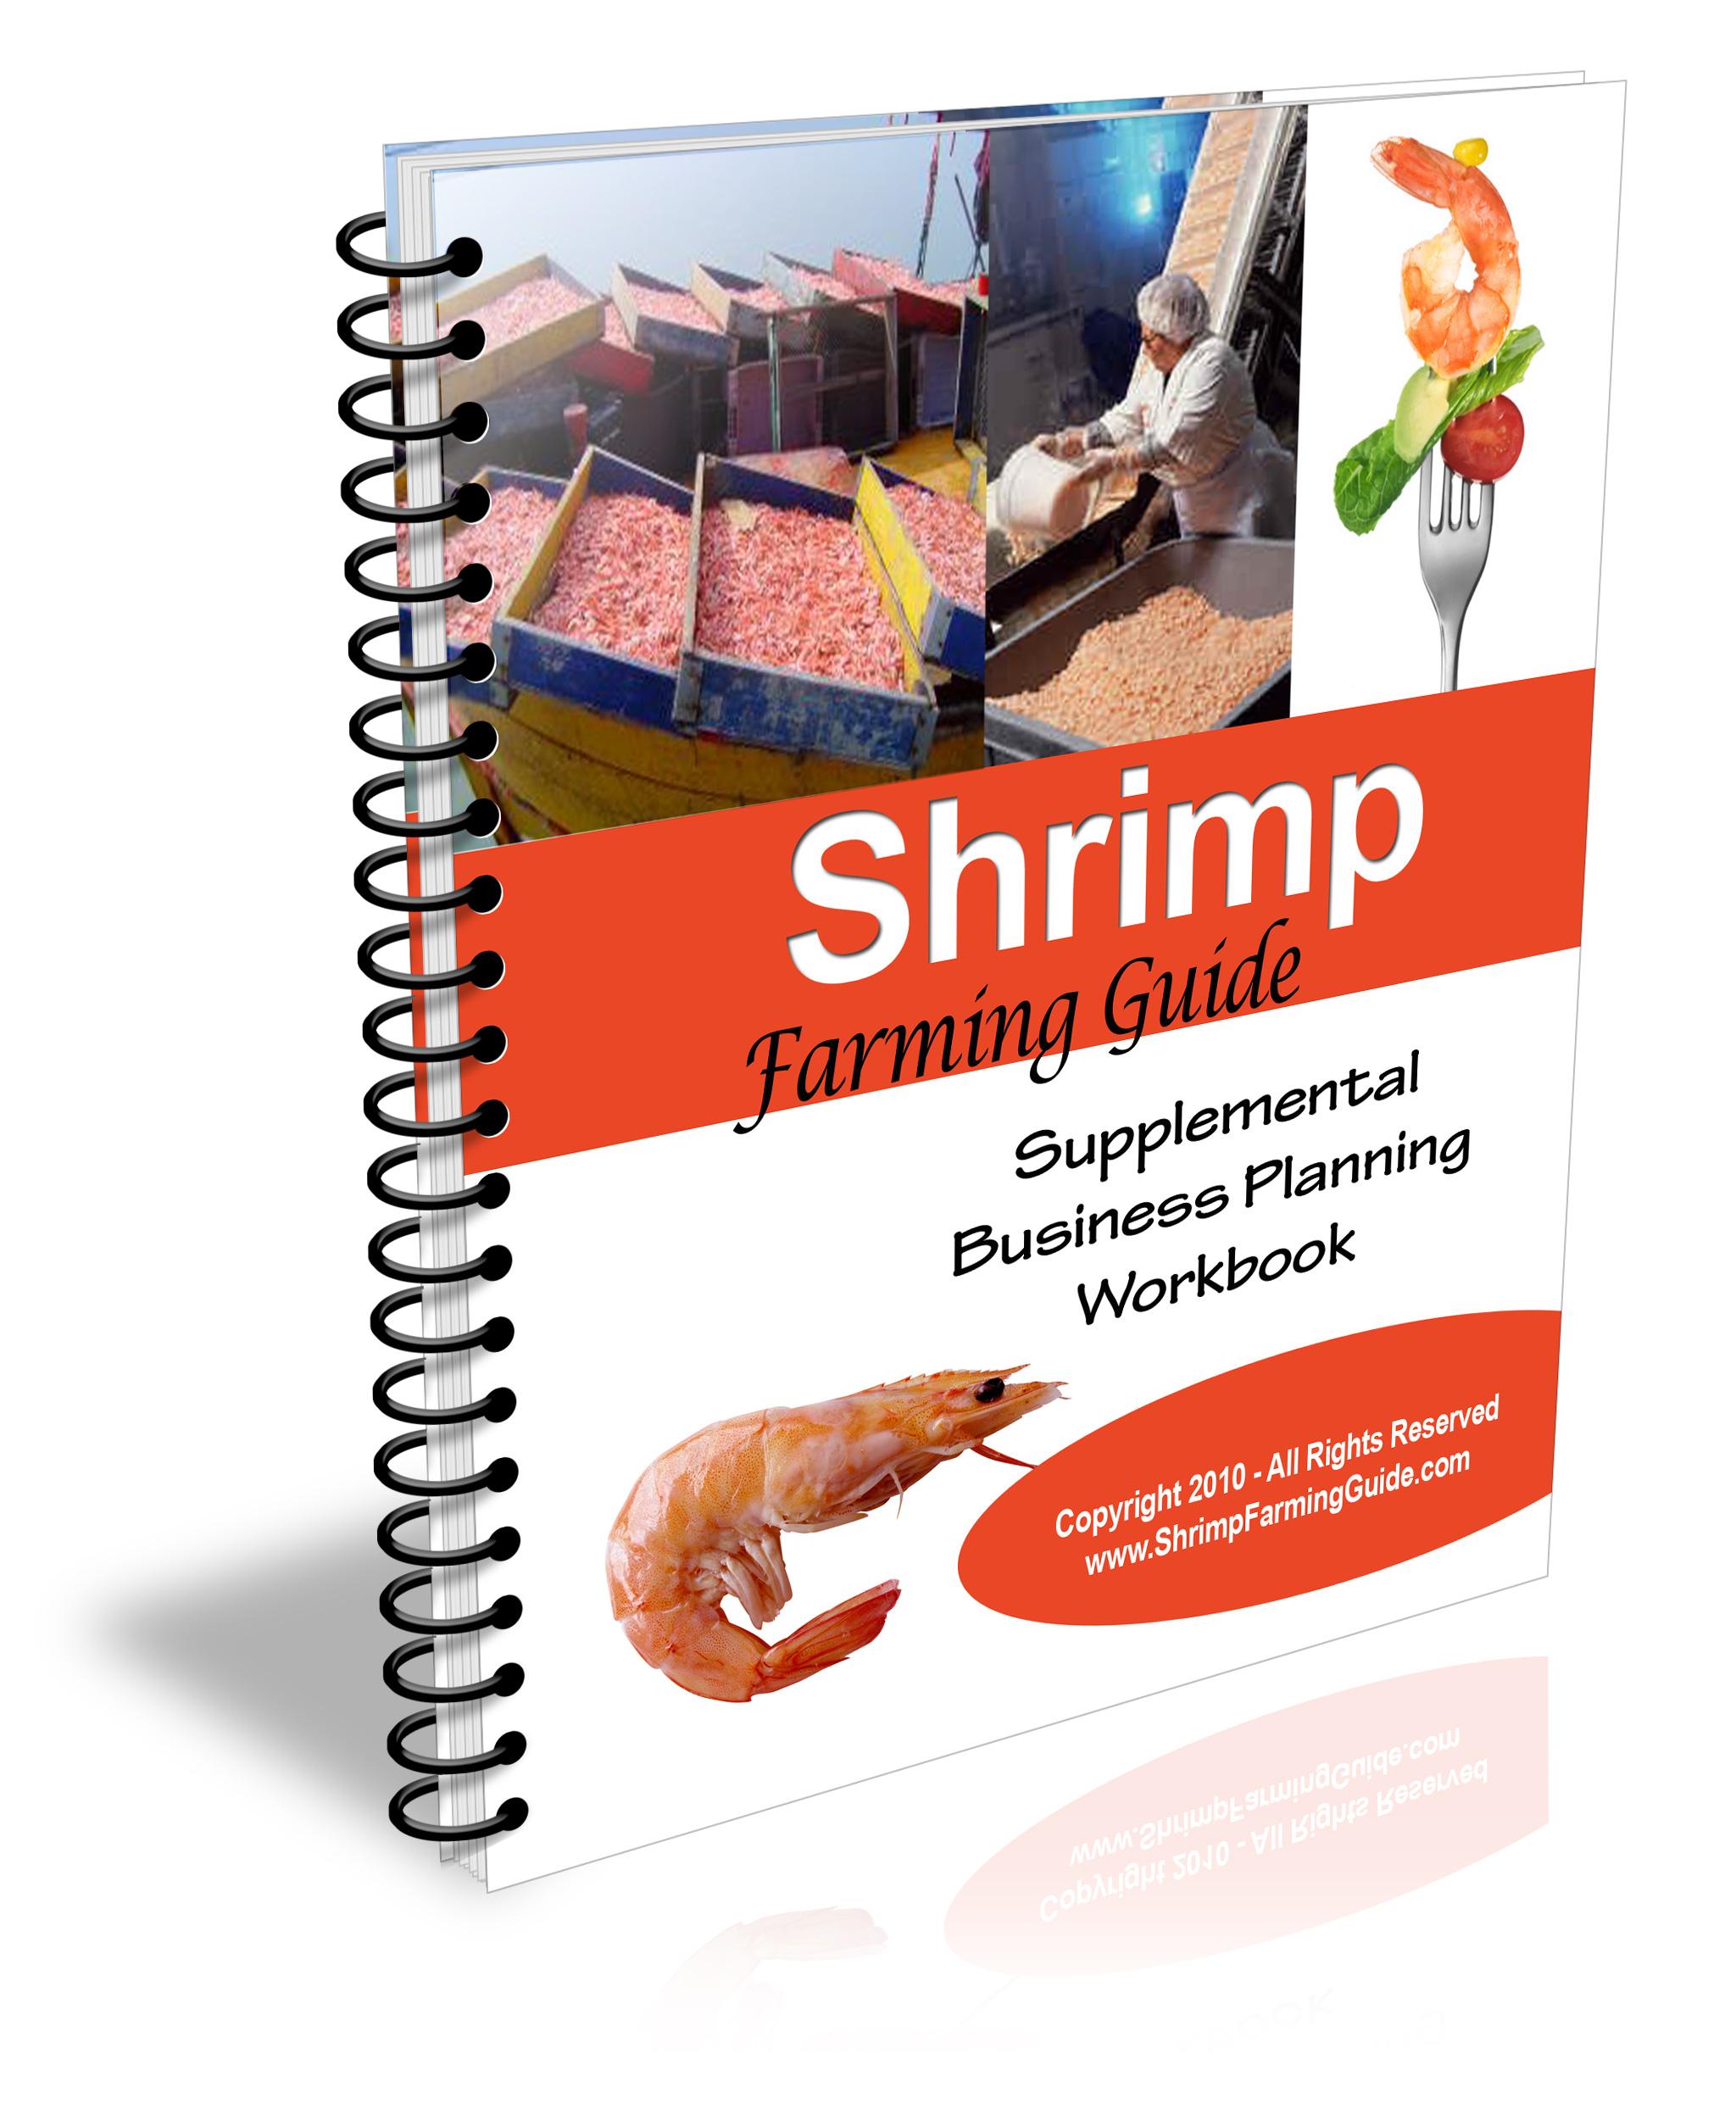 Prawn Hatchery Manual Ebook Gx270 Qaw Engine Jpn Honda Small Control 1 Diagram And Parts Image Array Shrimp Farming Guide Rh Shrimpfarminginfo Com